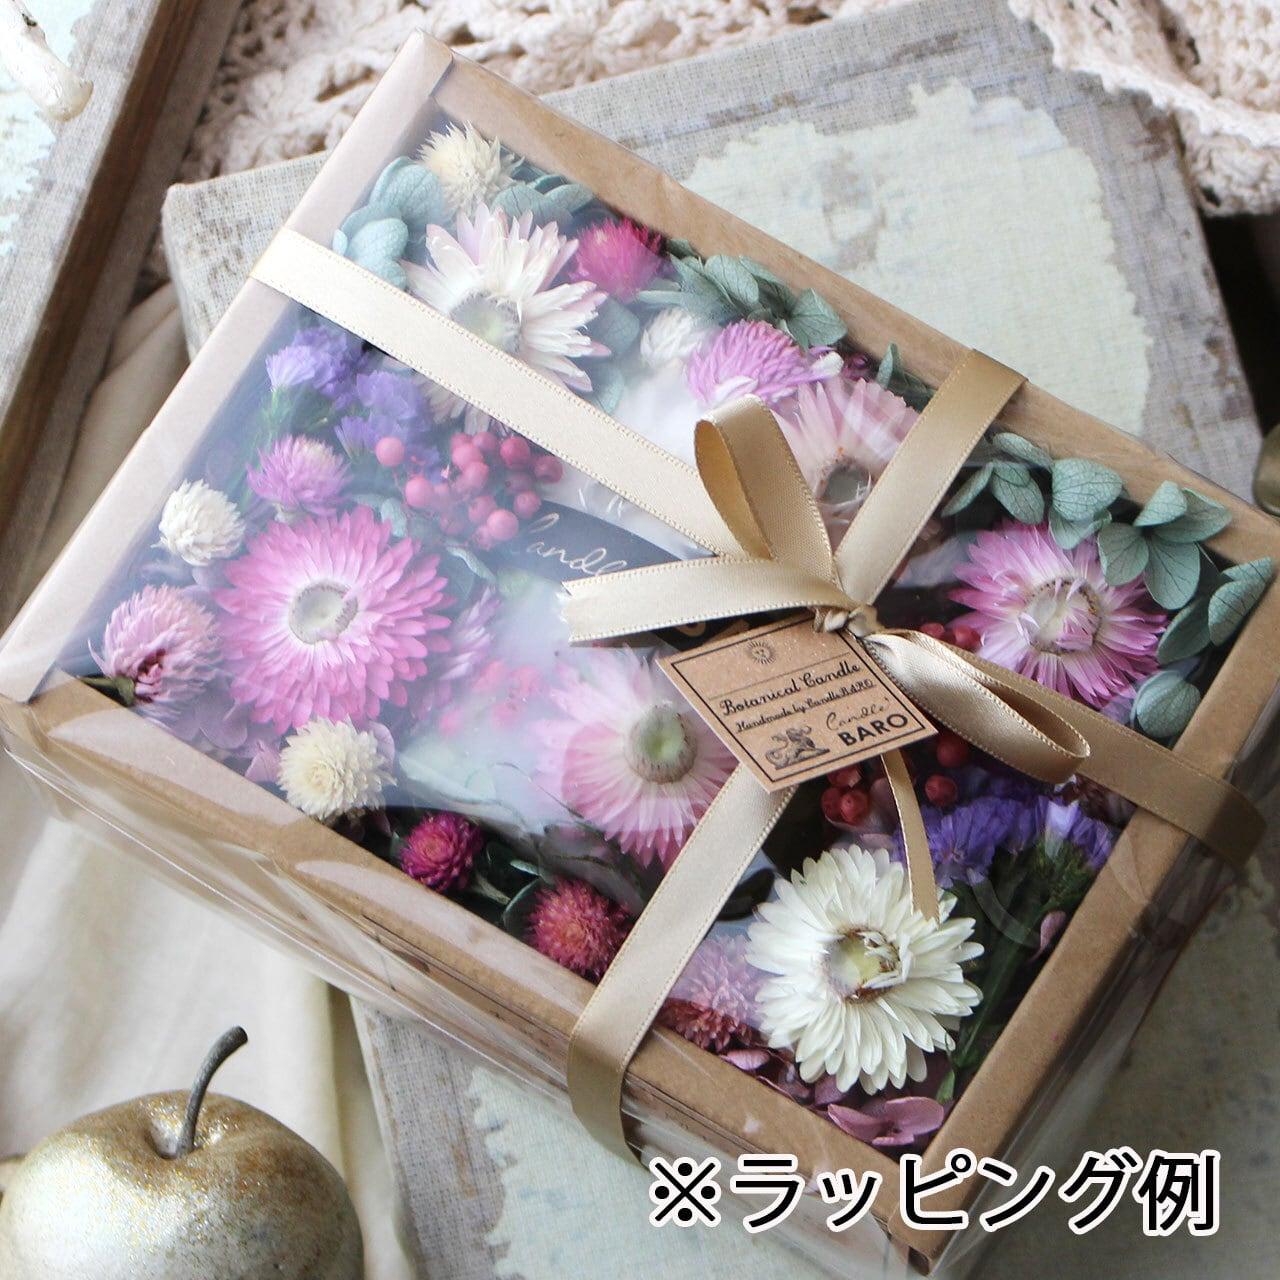 H581 透明ラッピング&紙袋付き☆ボタニカルキャンドルギフト ガーデン